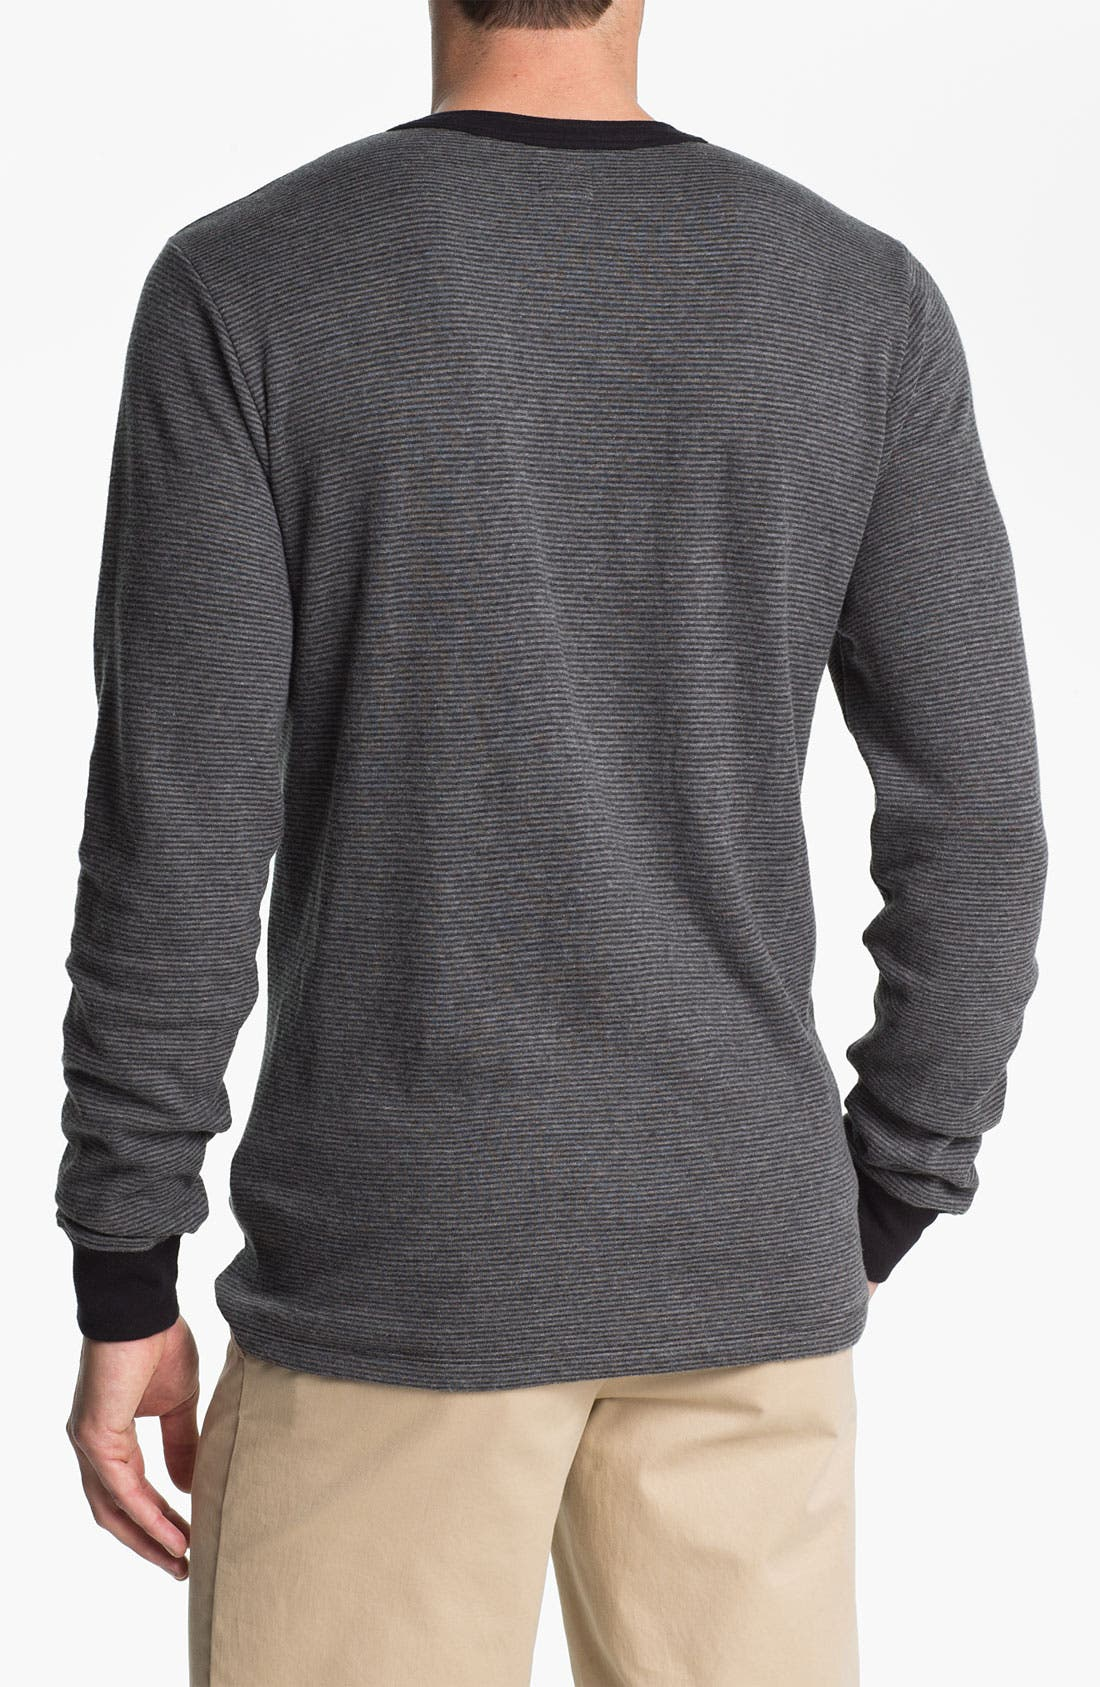 Alternate Image 2  - Obey Microstripe Slim Fit Henley T-Shirt